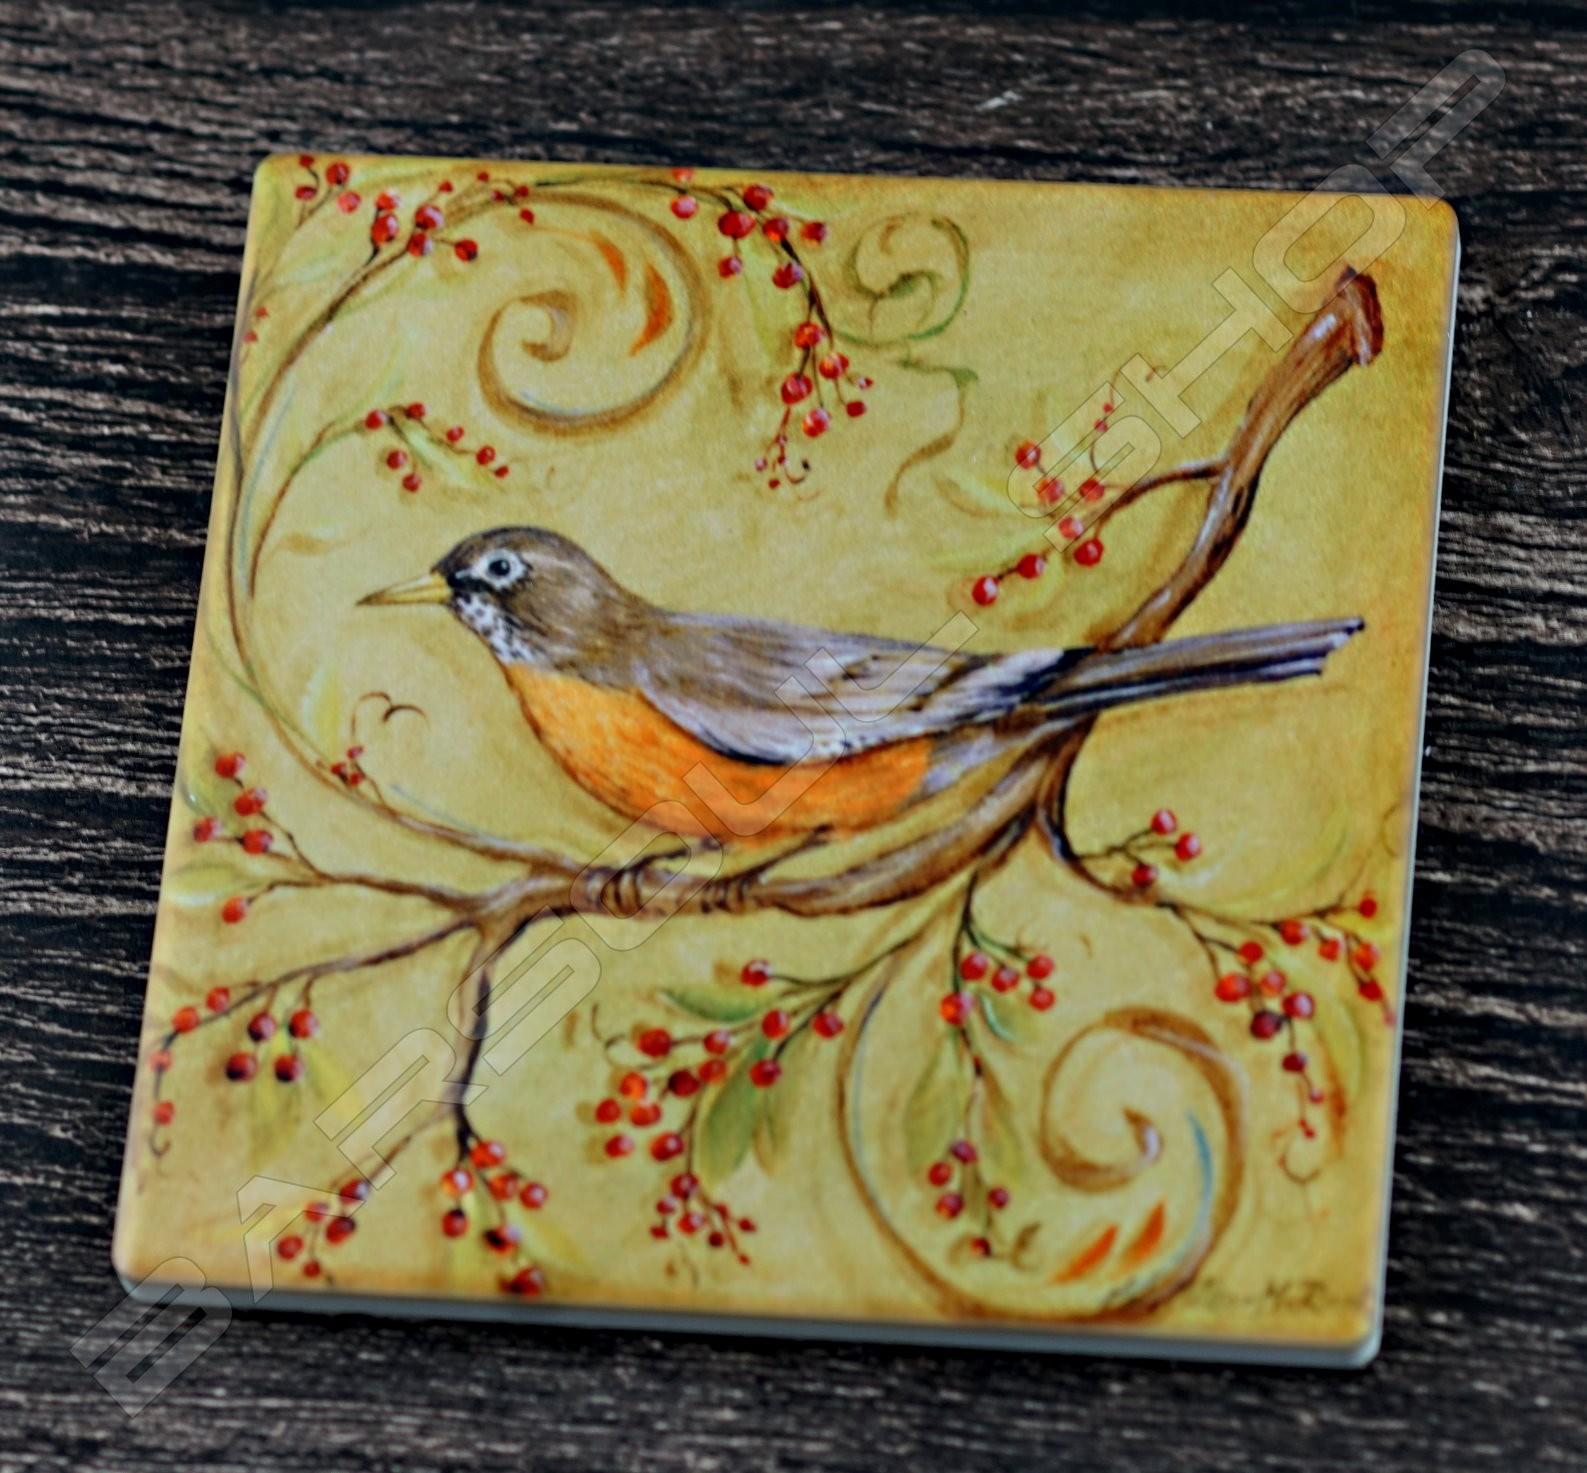 方形陶瓷杯墊(D) Square ceramics coaster